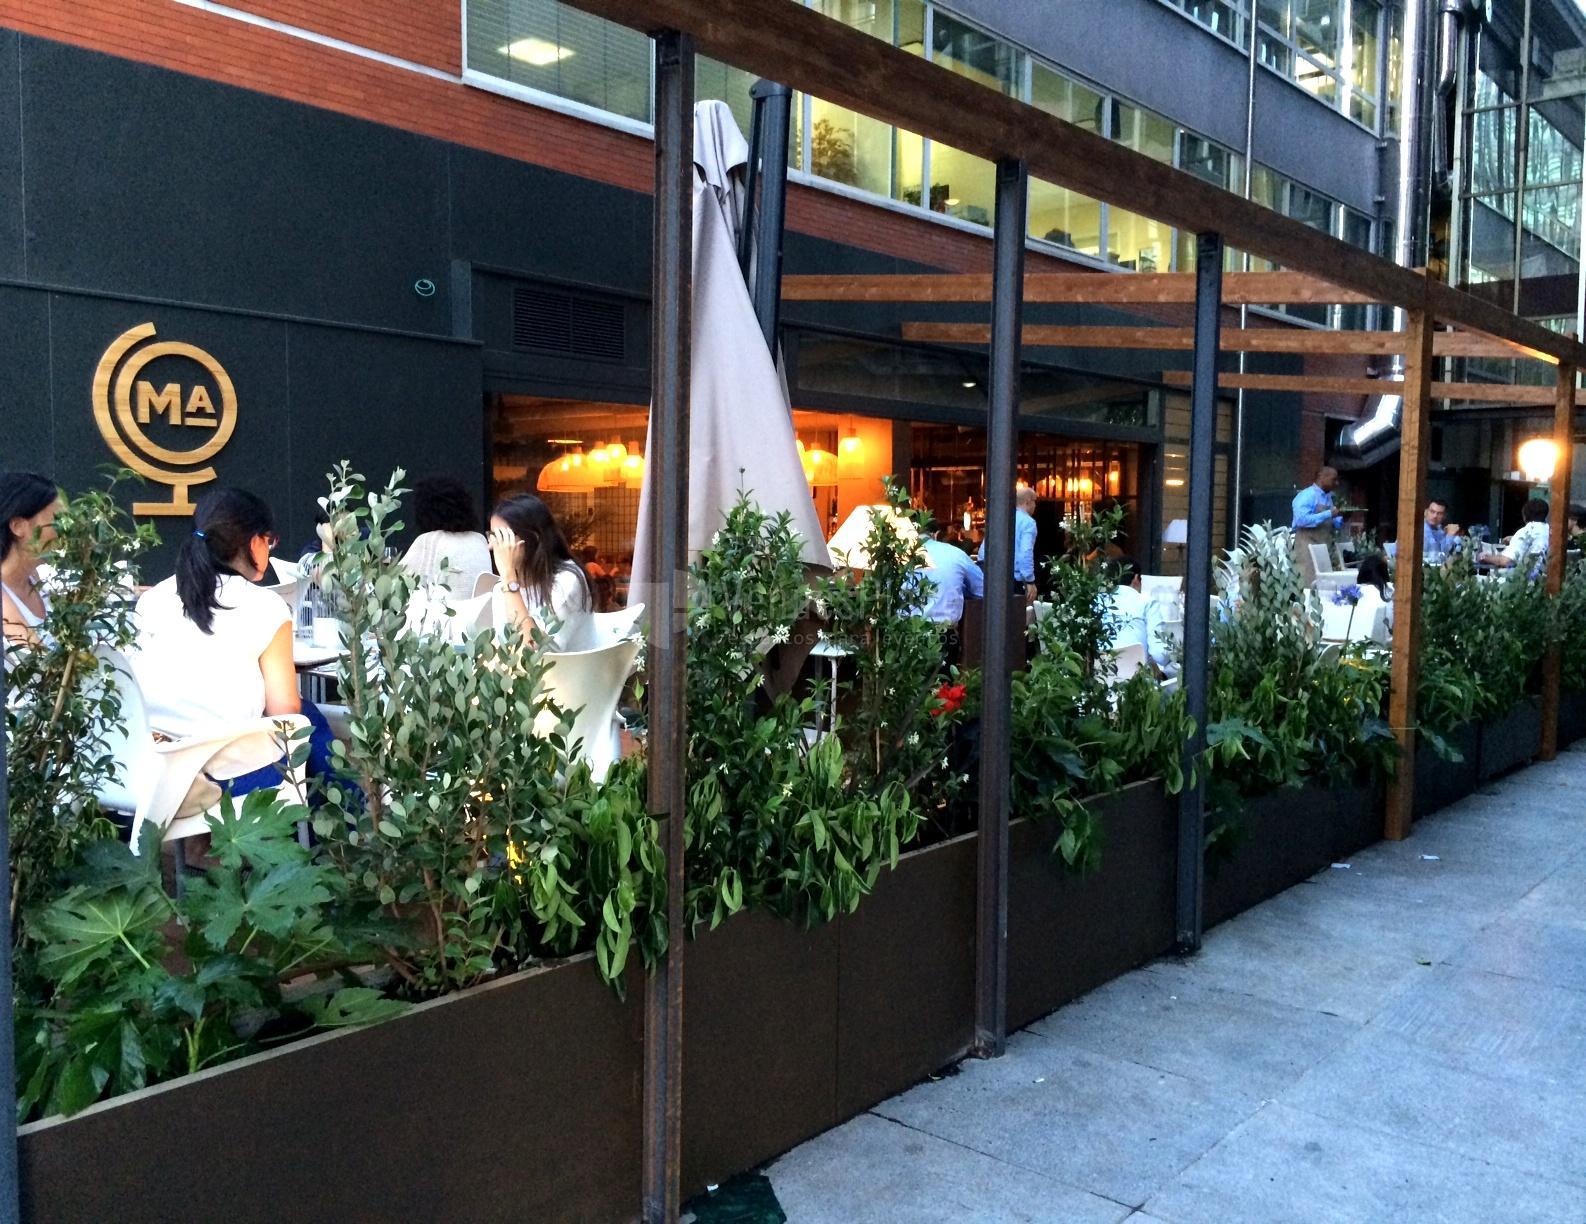 Restaurante marieta venuesplace - La marieta madrid ...